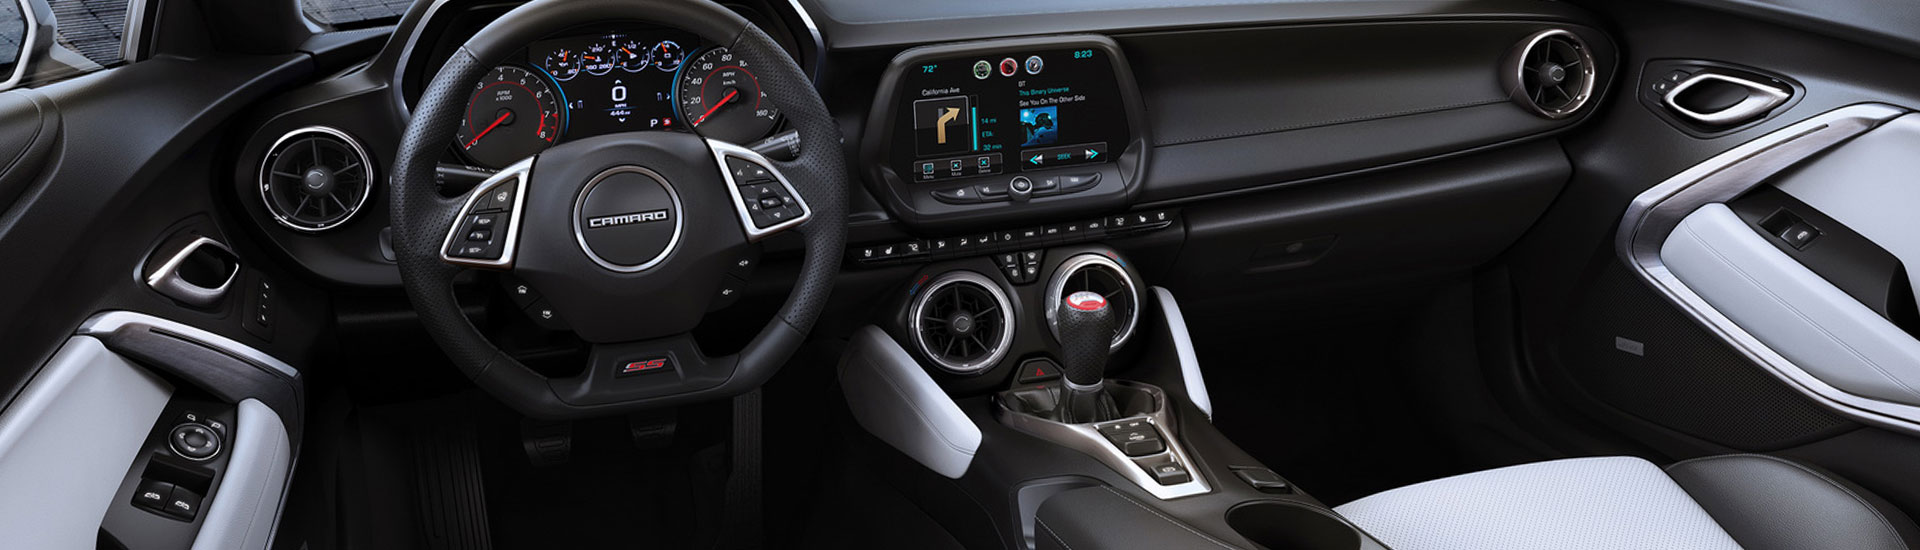 2016 chevrolet camaro dash kits custom 2016 chevrolet camaro 2016 chevrolet camaro custom dash kits publicscrutiny Image collections